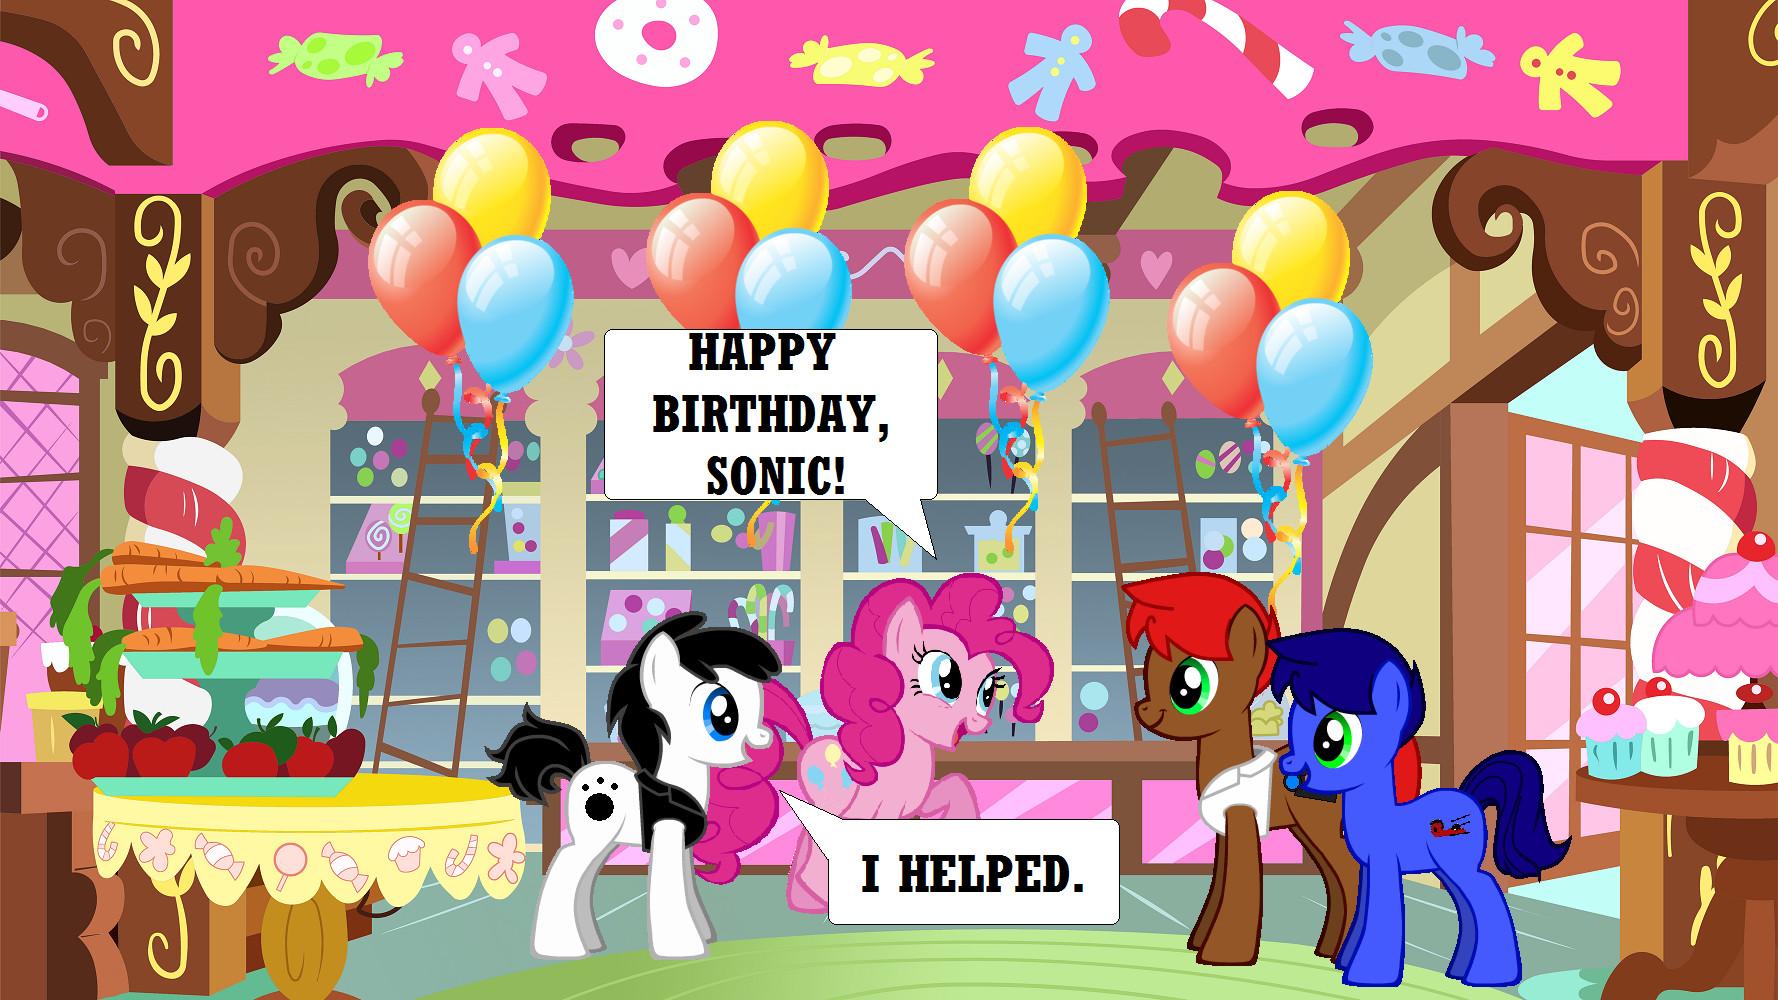 Happy Birthday Sonic The Hedgehog Pony Style By Eli J Brony